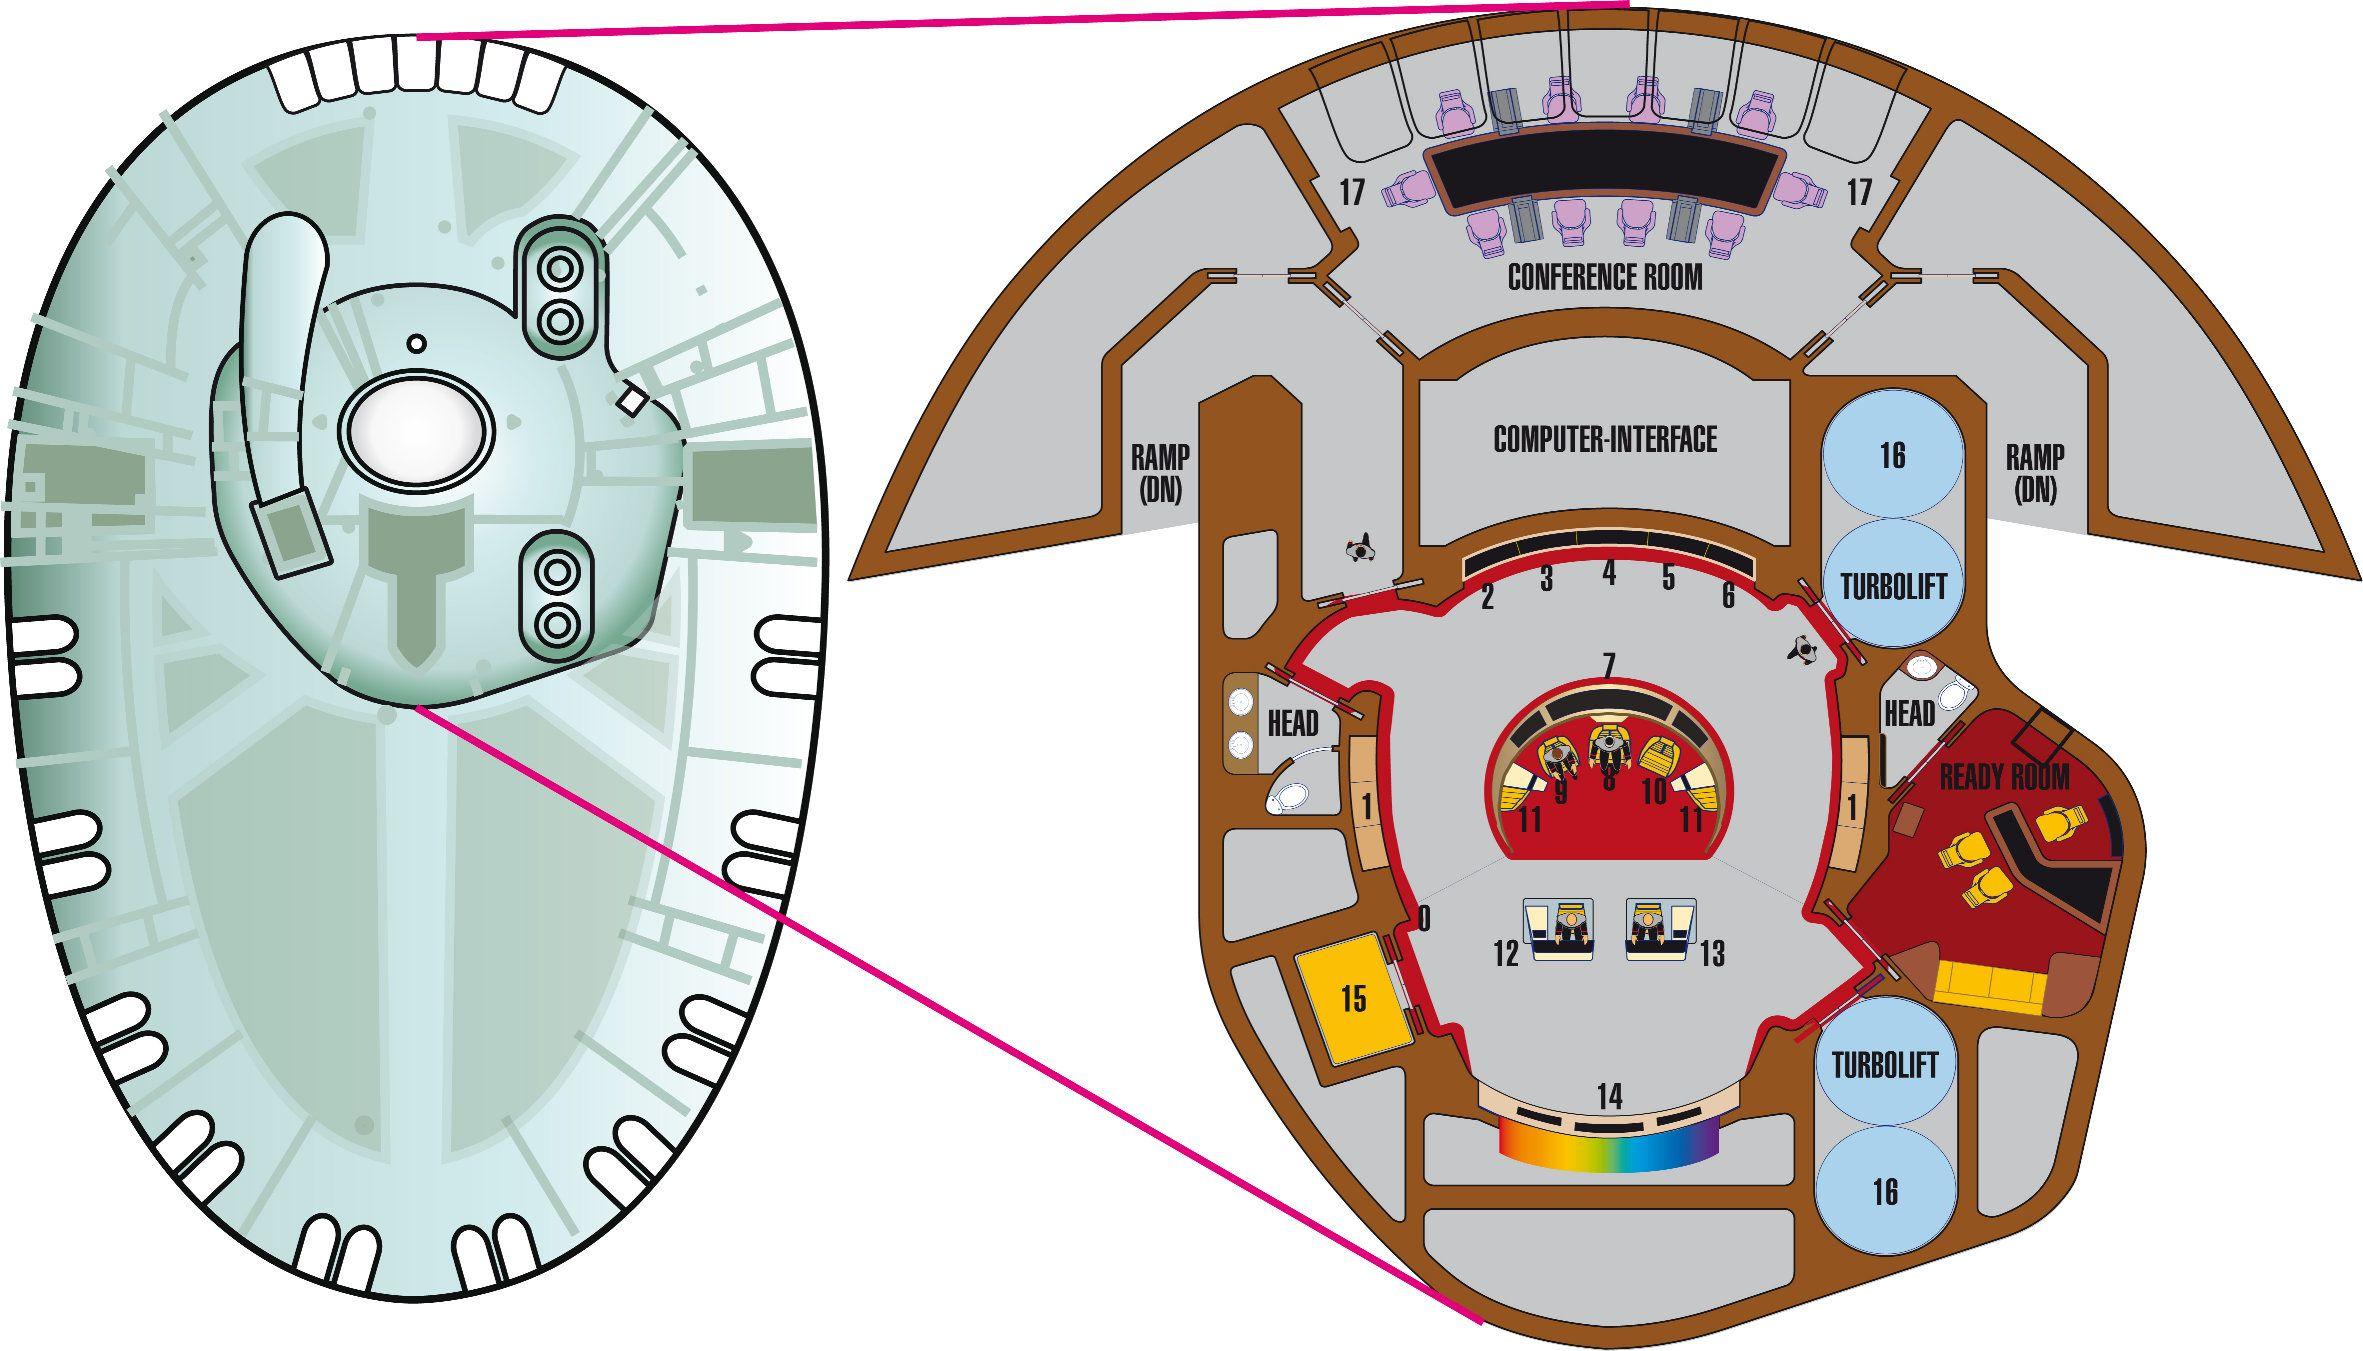 enterprise d bridge puente by godstaff on deviantart star trek pinterest serien. Black Bedroom Furniture Sets. Home Design Ideas